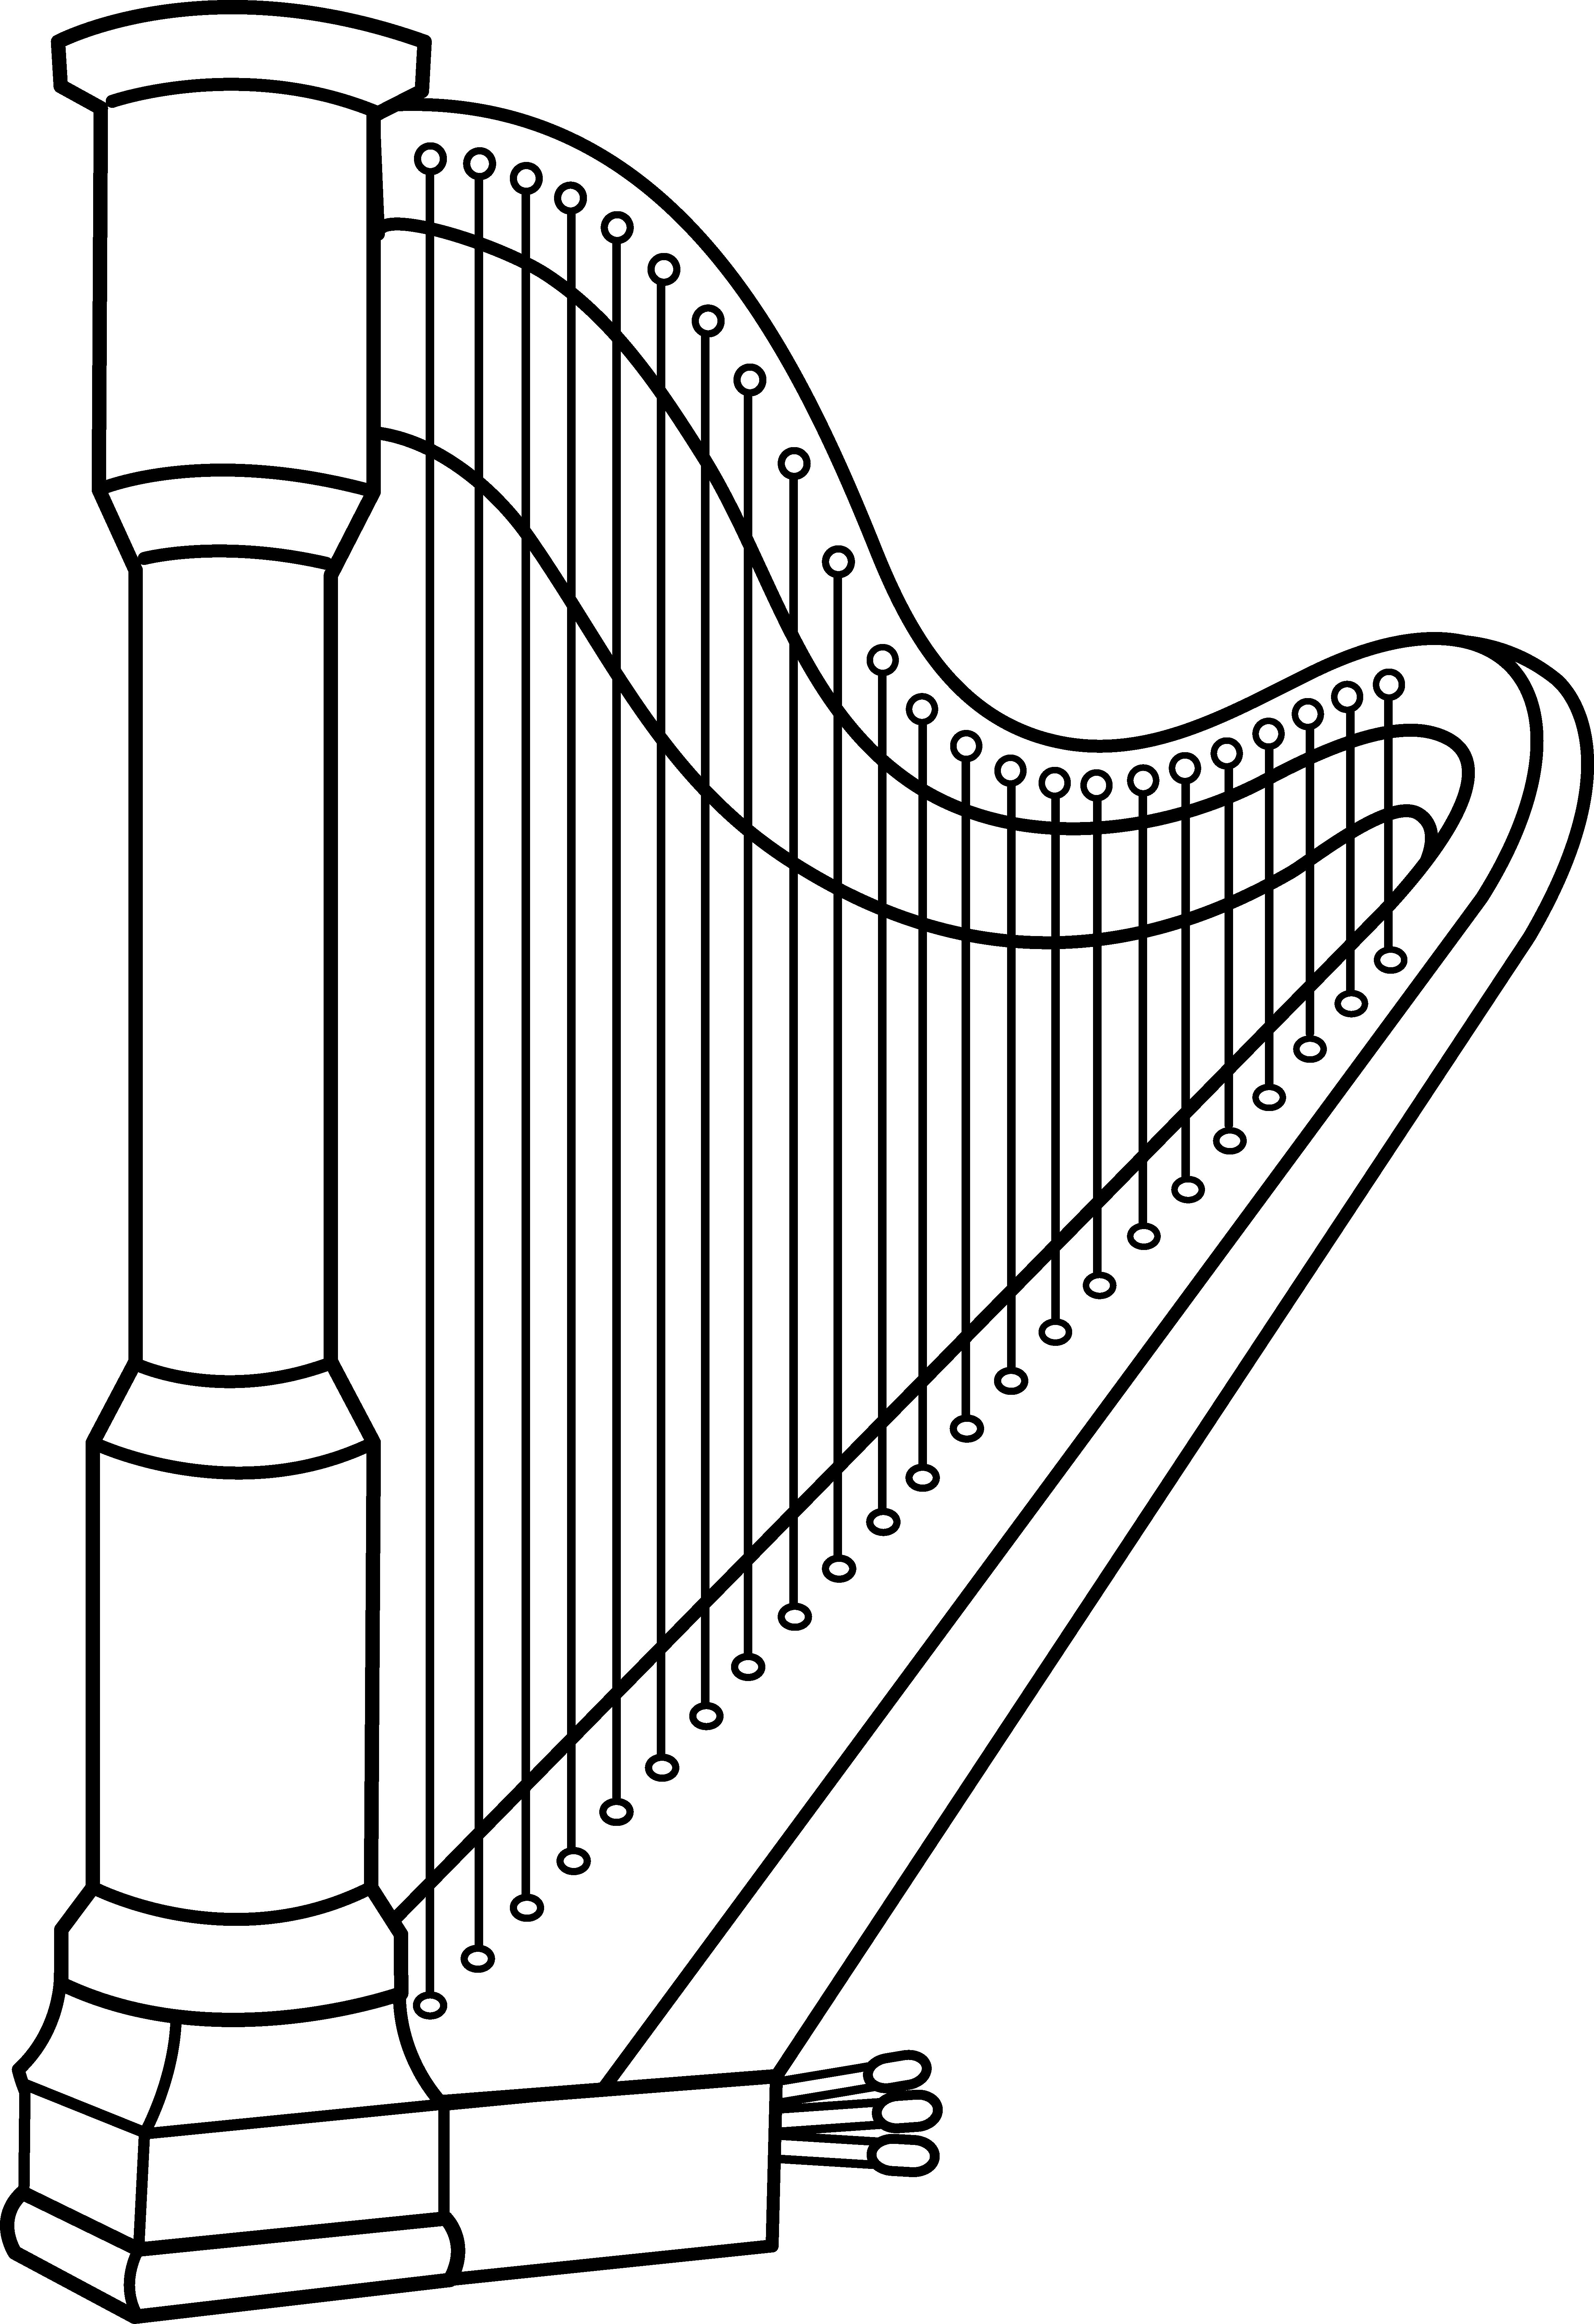 Musical Harp Line Art Free Clip Clipart-Musical harp line art free clip clipart-14